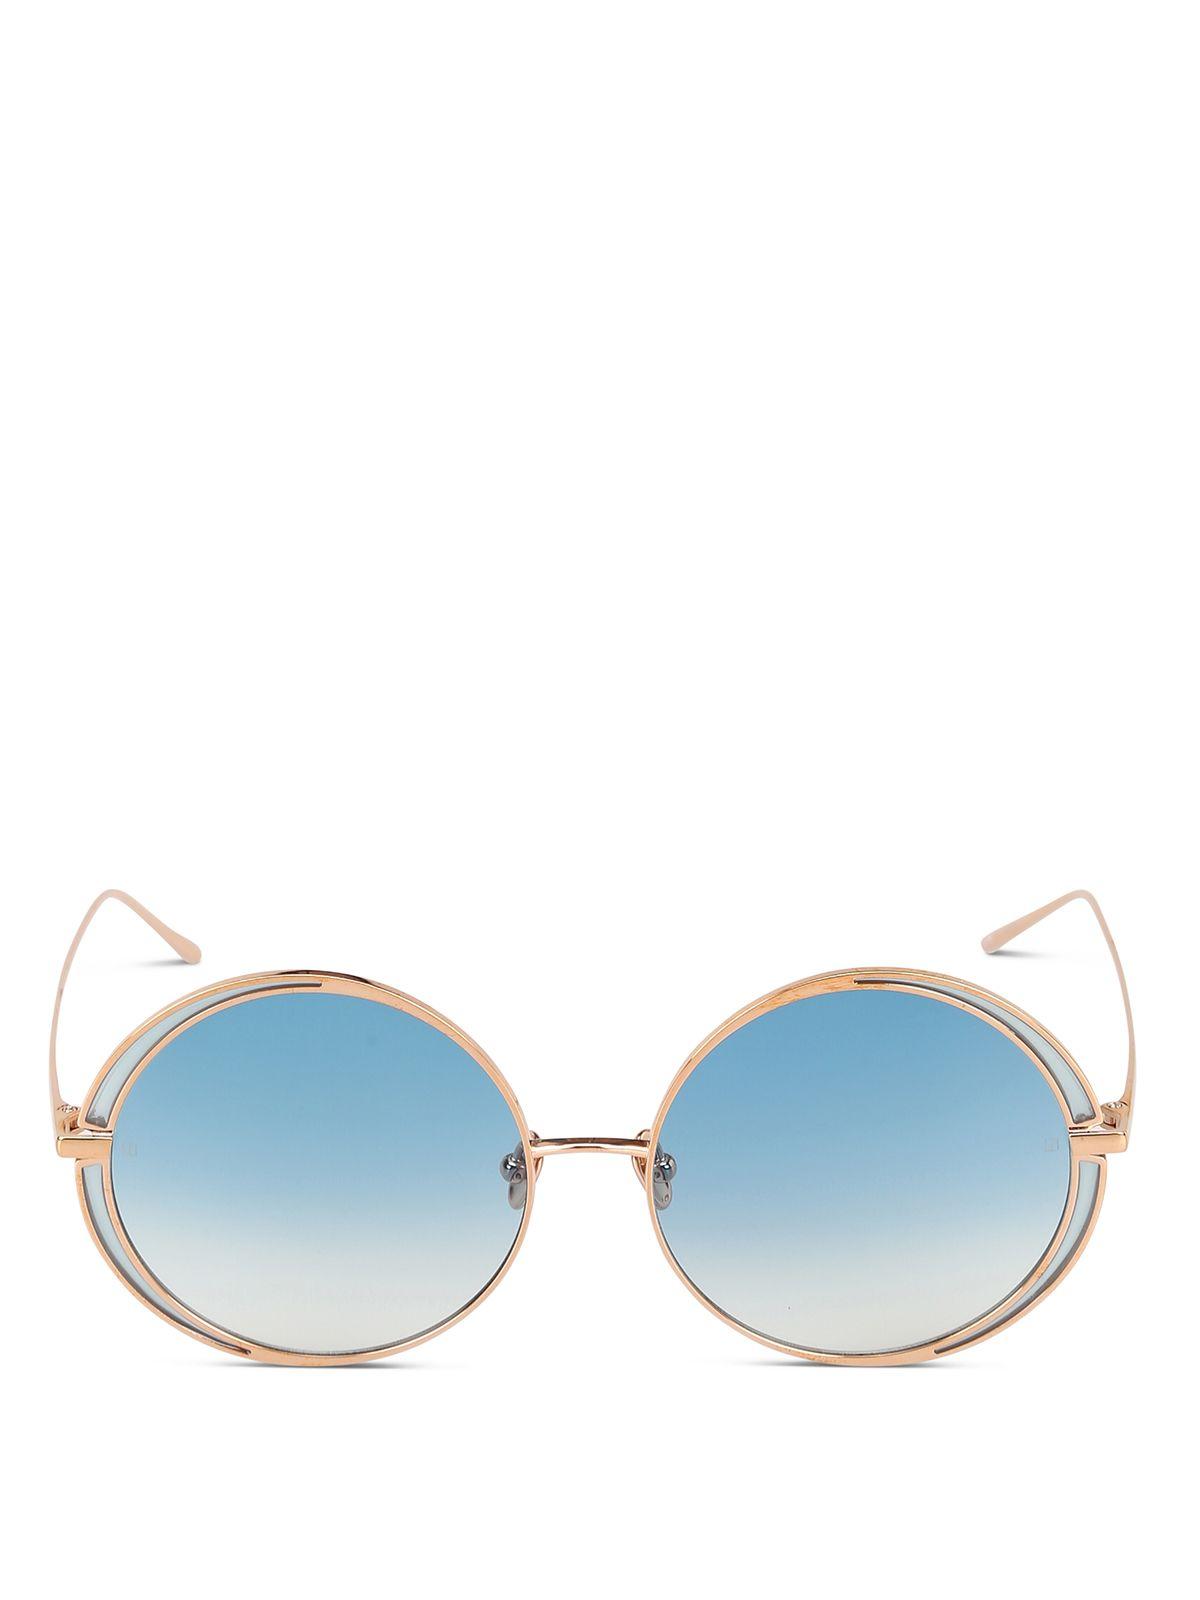 Linda Farrow Gold Metal Sunglasses